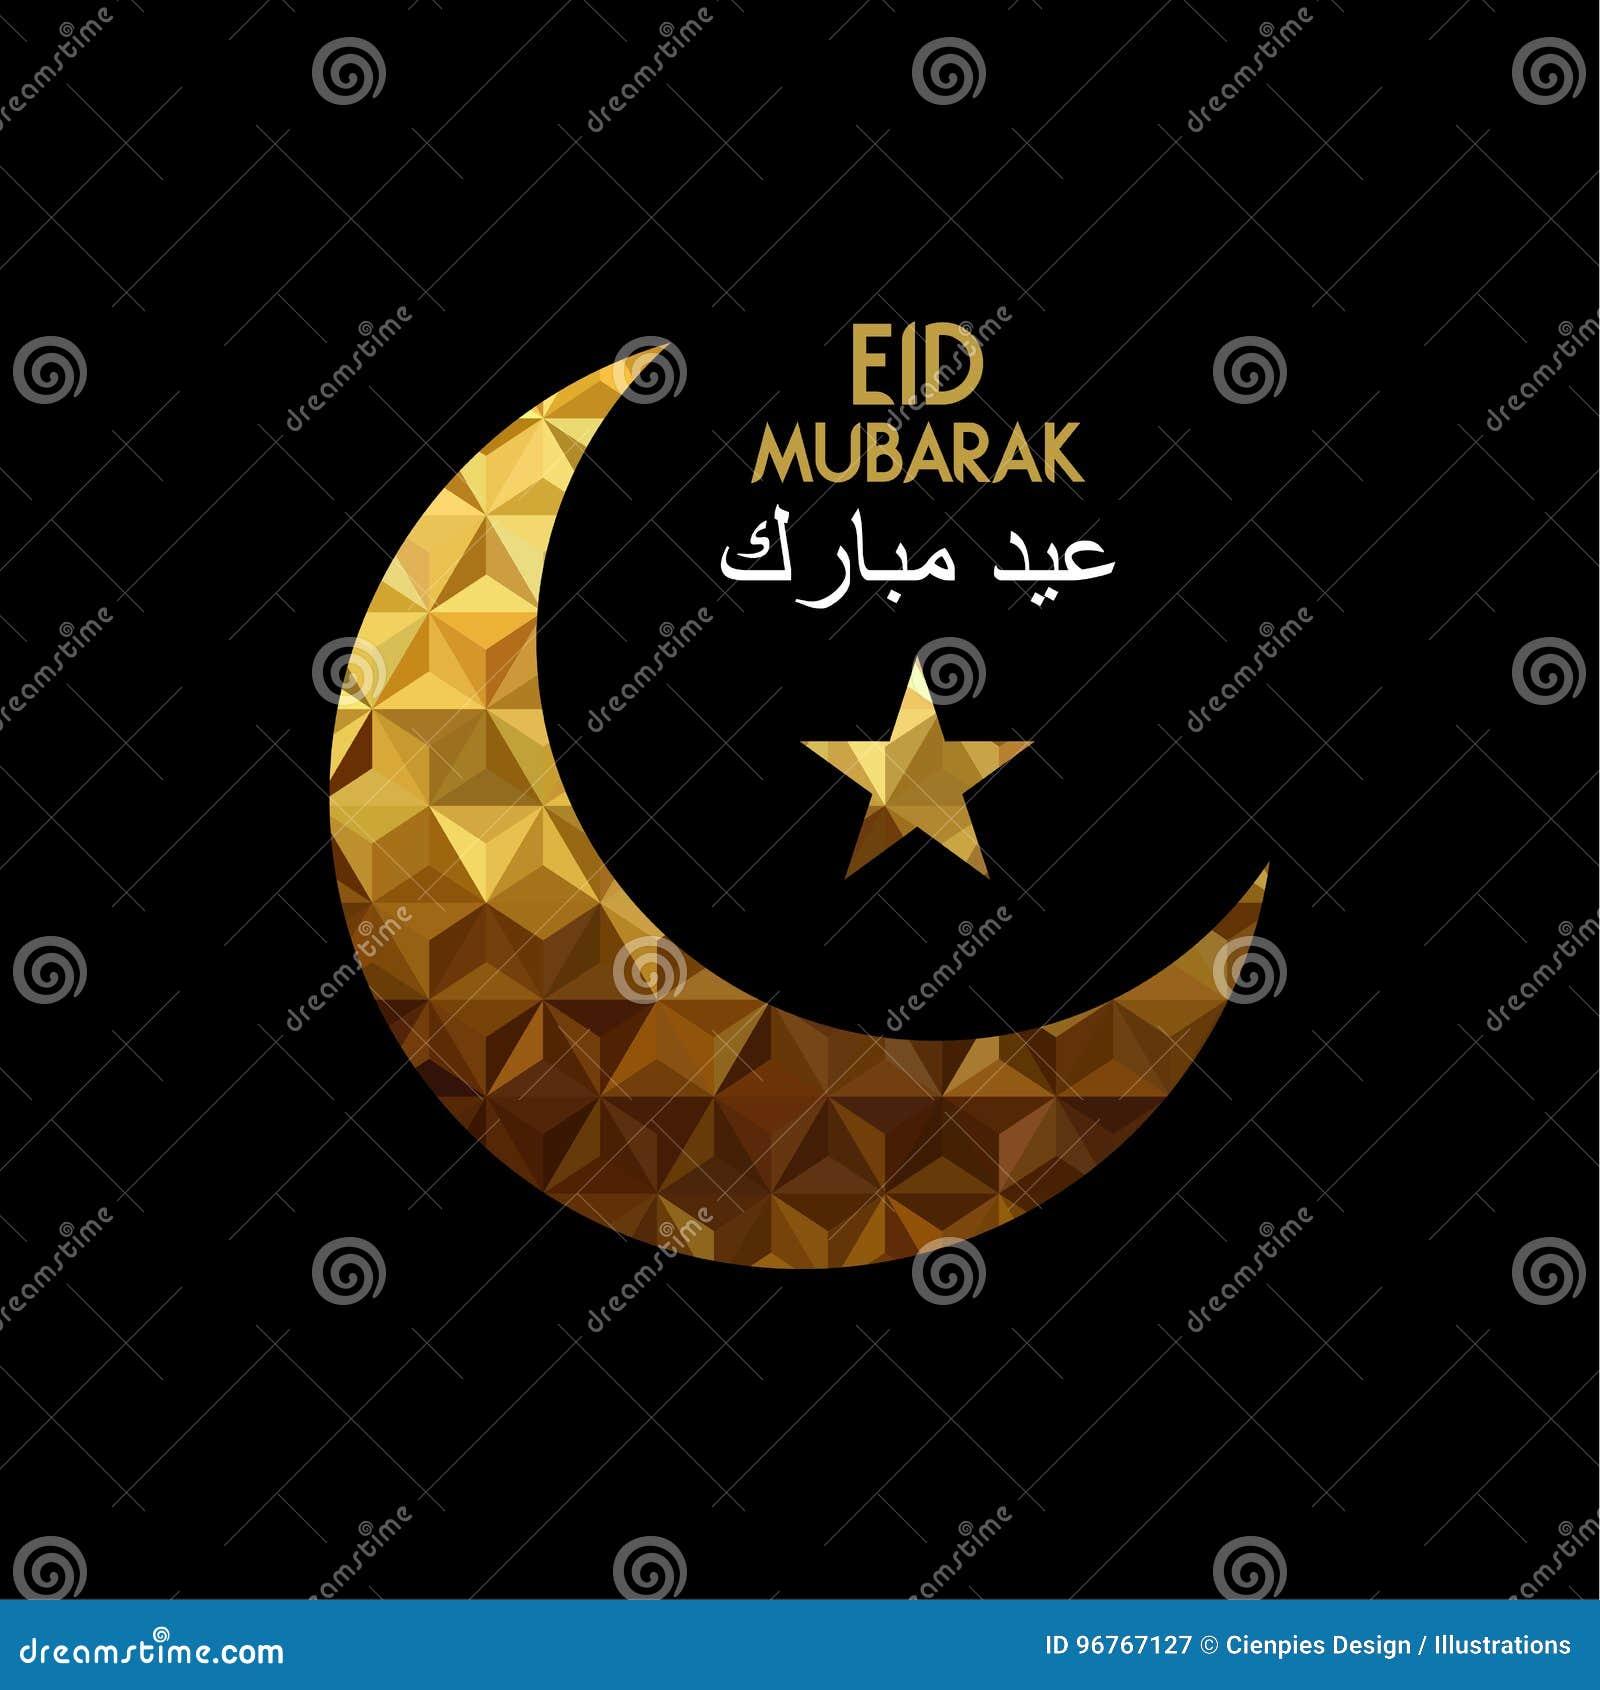 Eid Mubarak Greeting Card For Arabic Islam Holiday Stock Vector